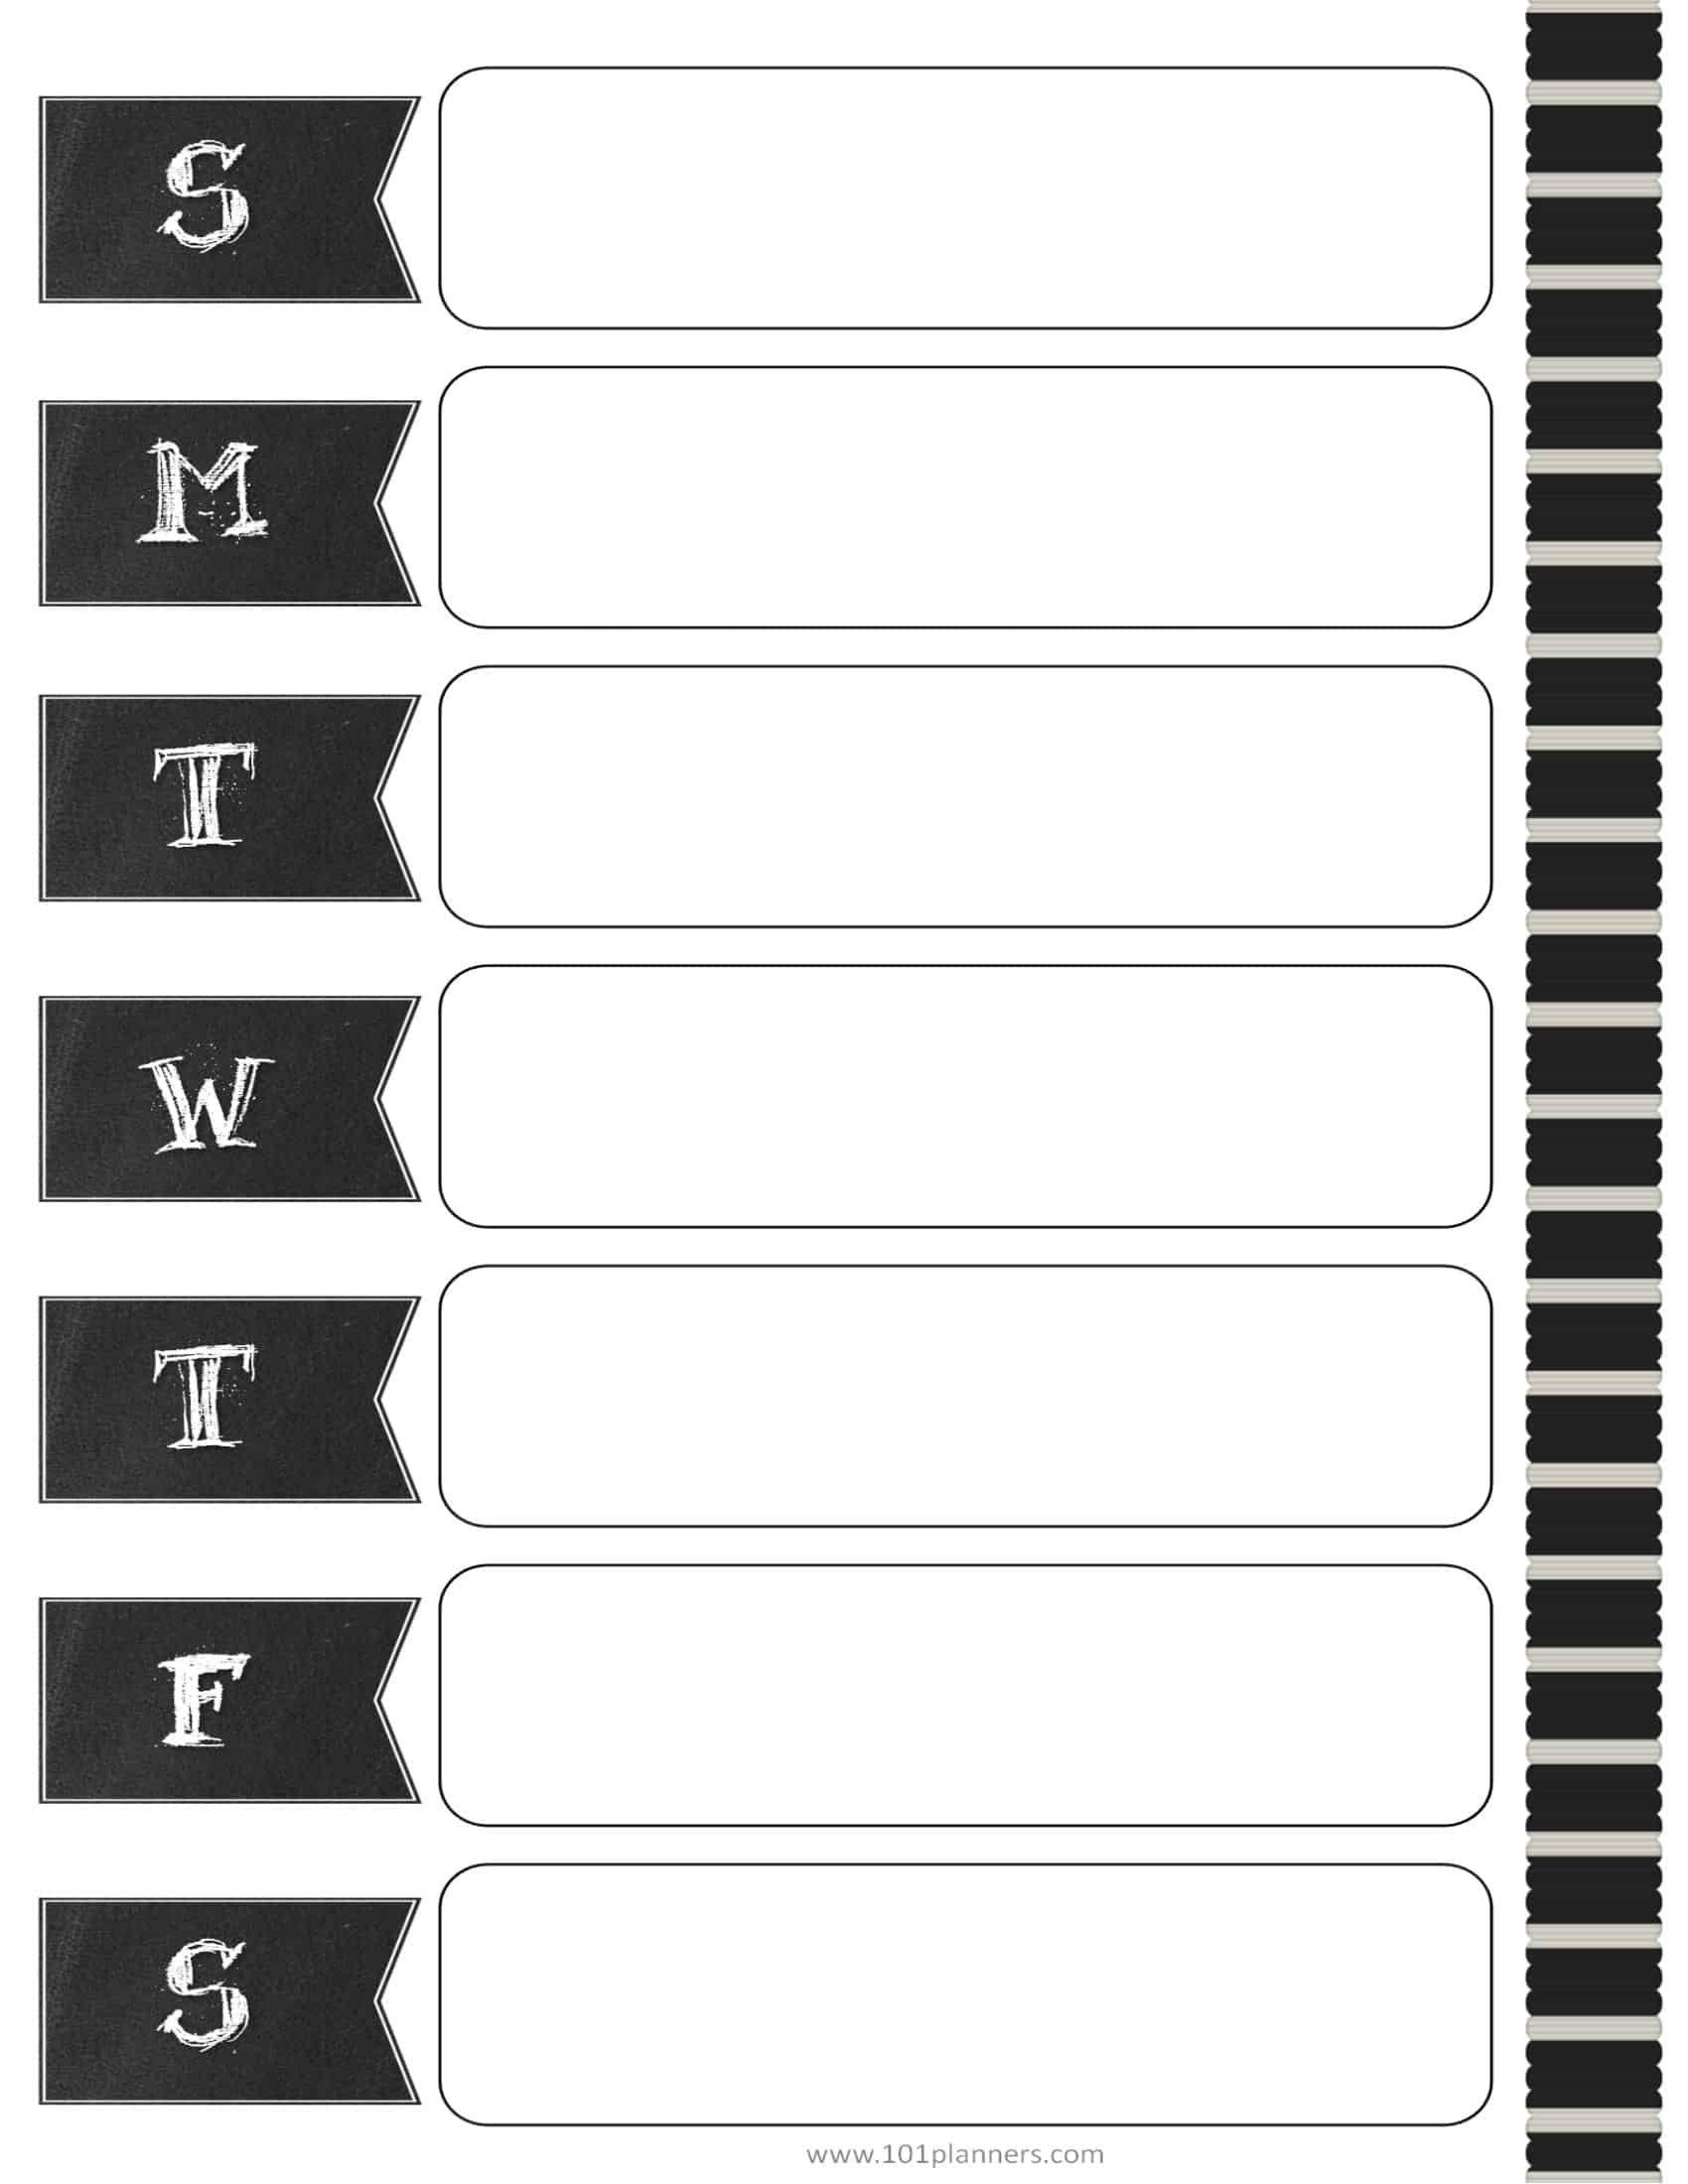 Weekly Calendar Maker | Create Free Custom Calendars Calendars That You Can Fill In